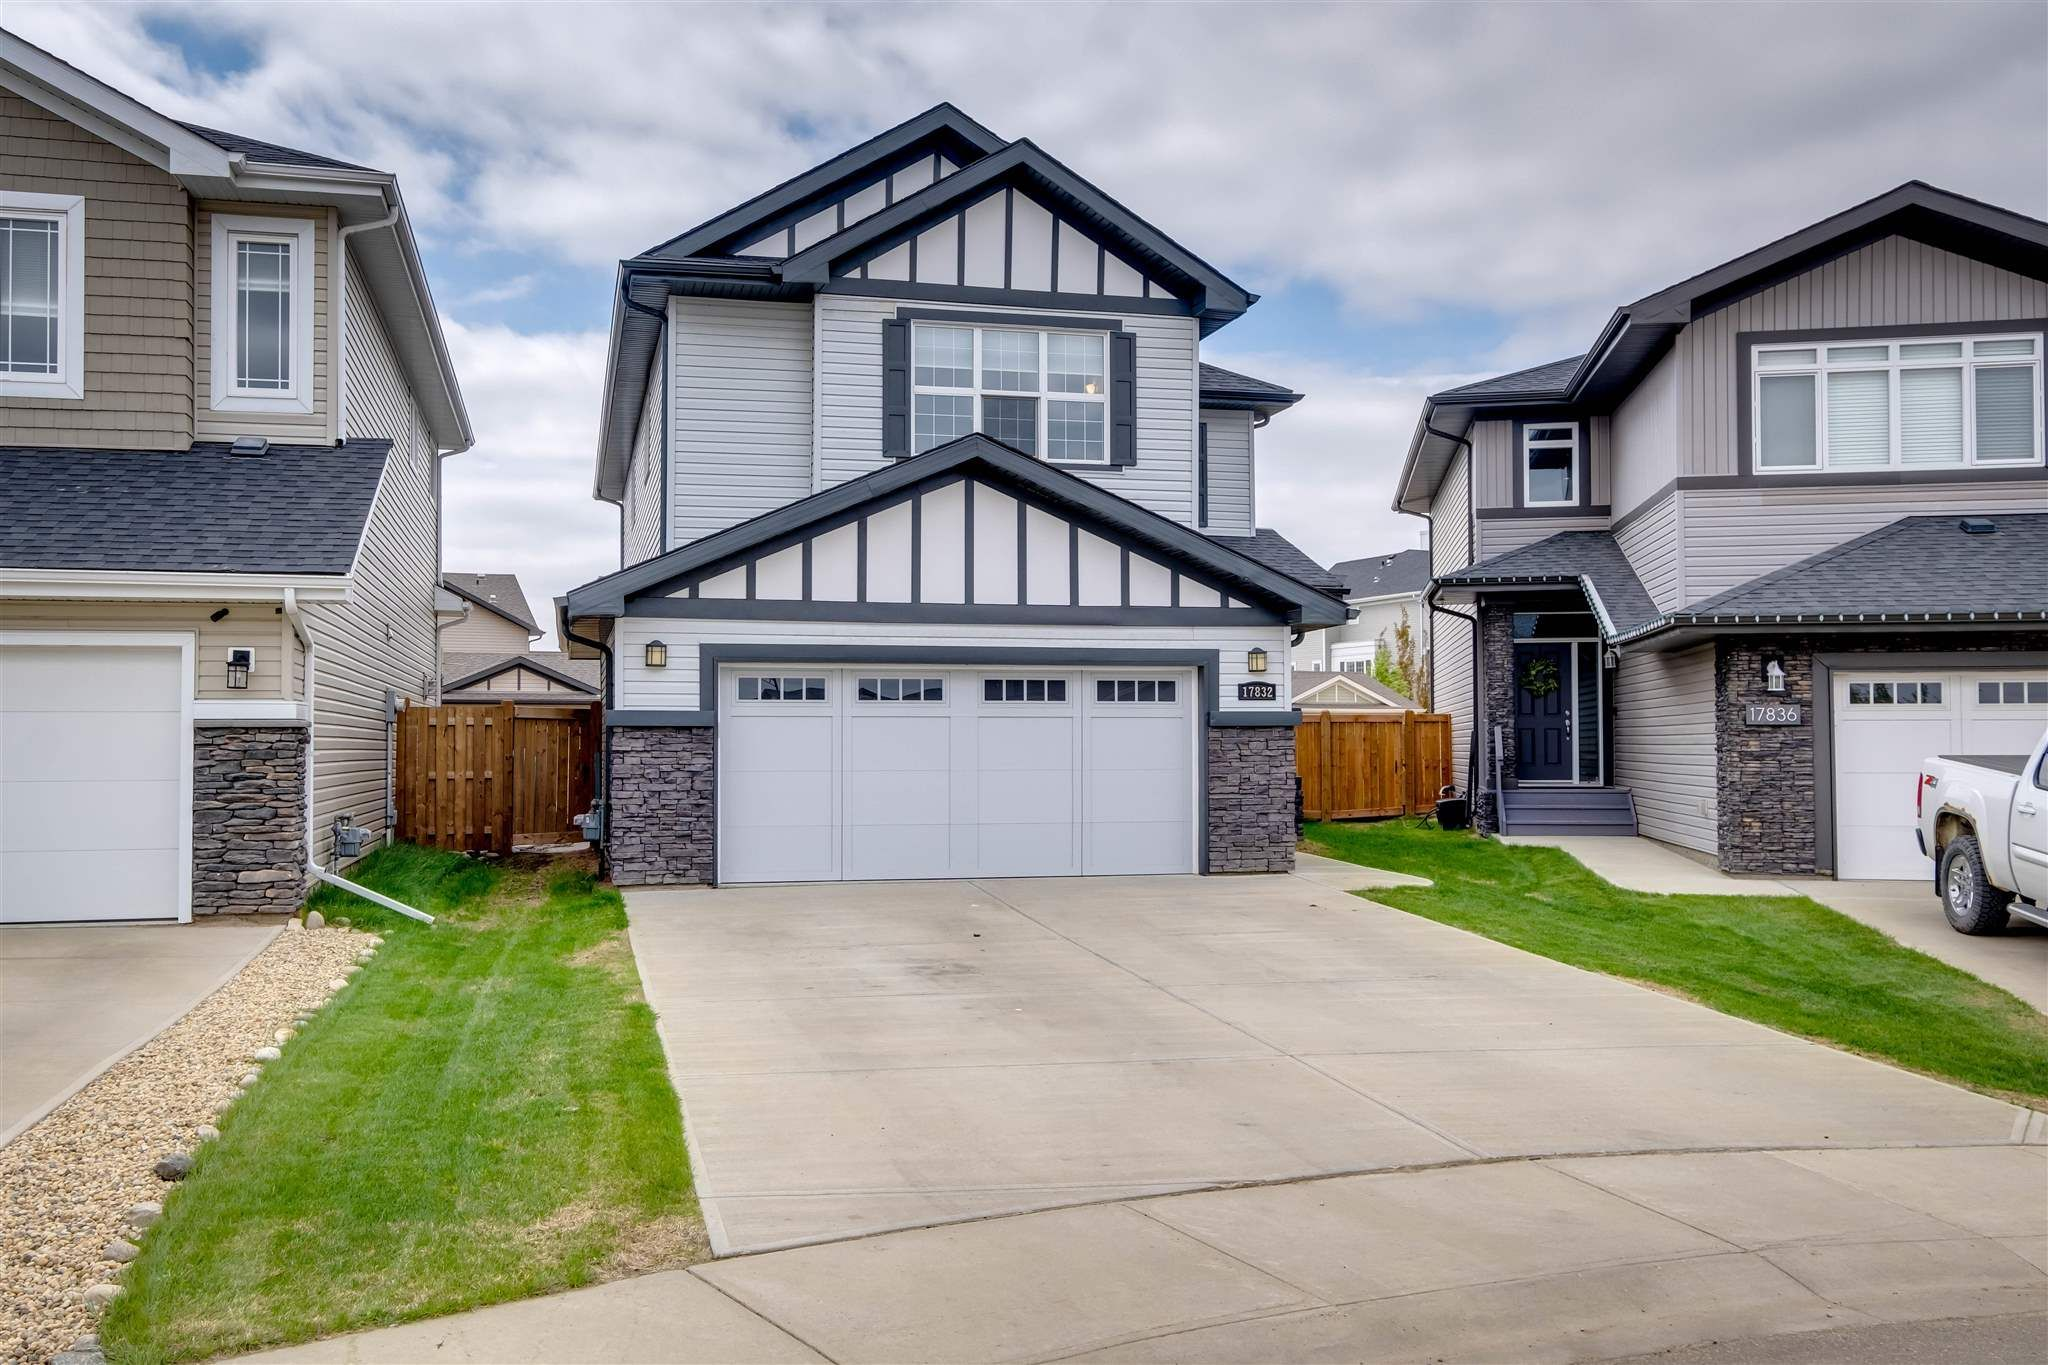 Main Photo: 17832 75 Street in Edmonton: Zone 28 House for sale : MLS®# E4248956